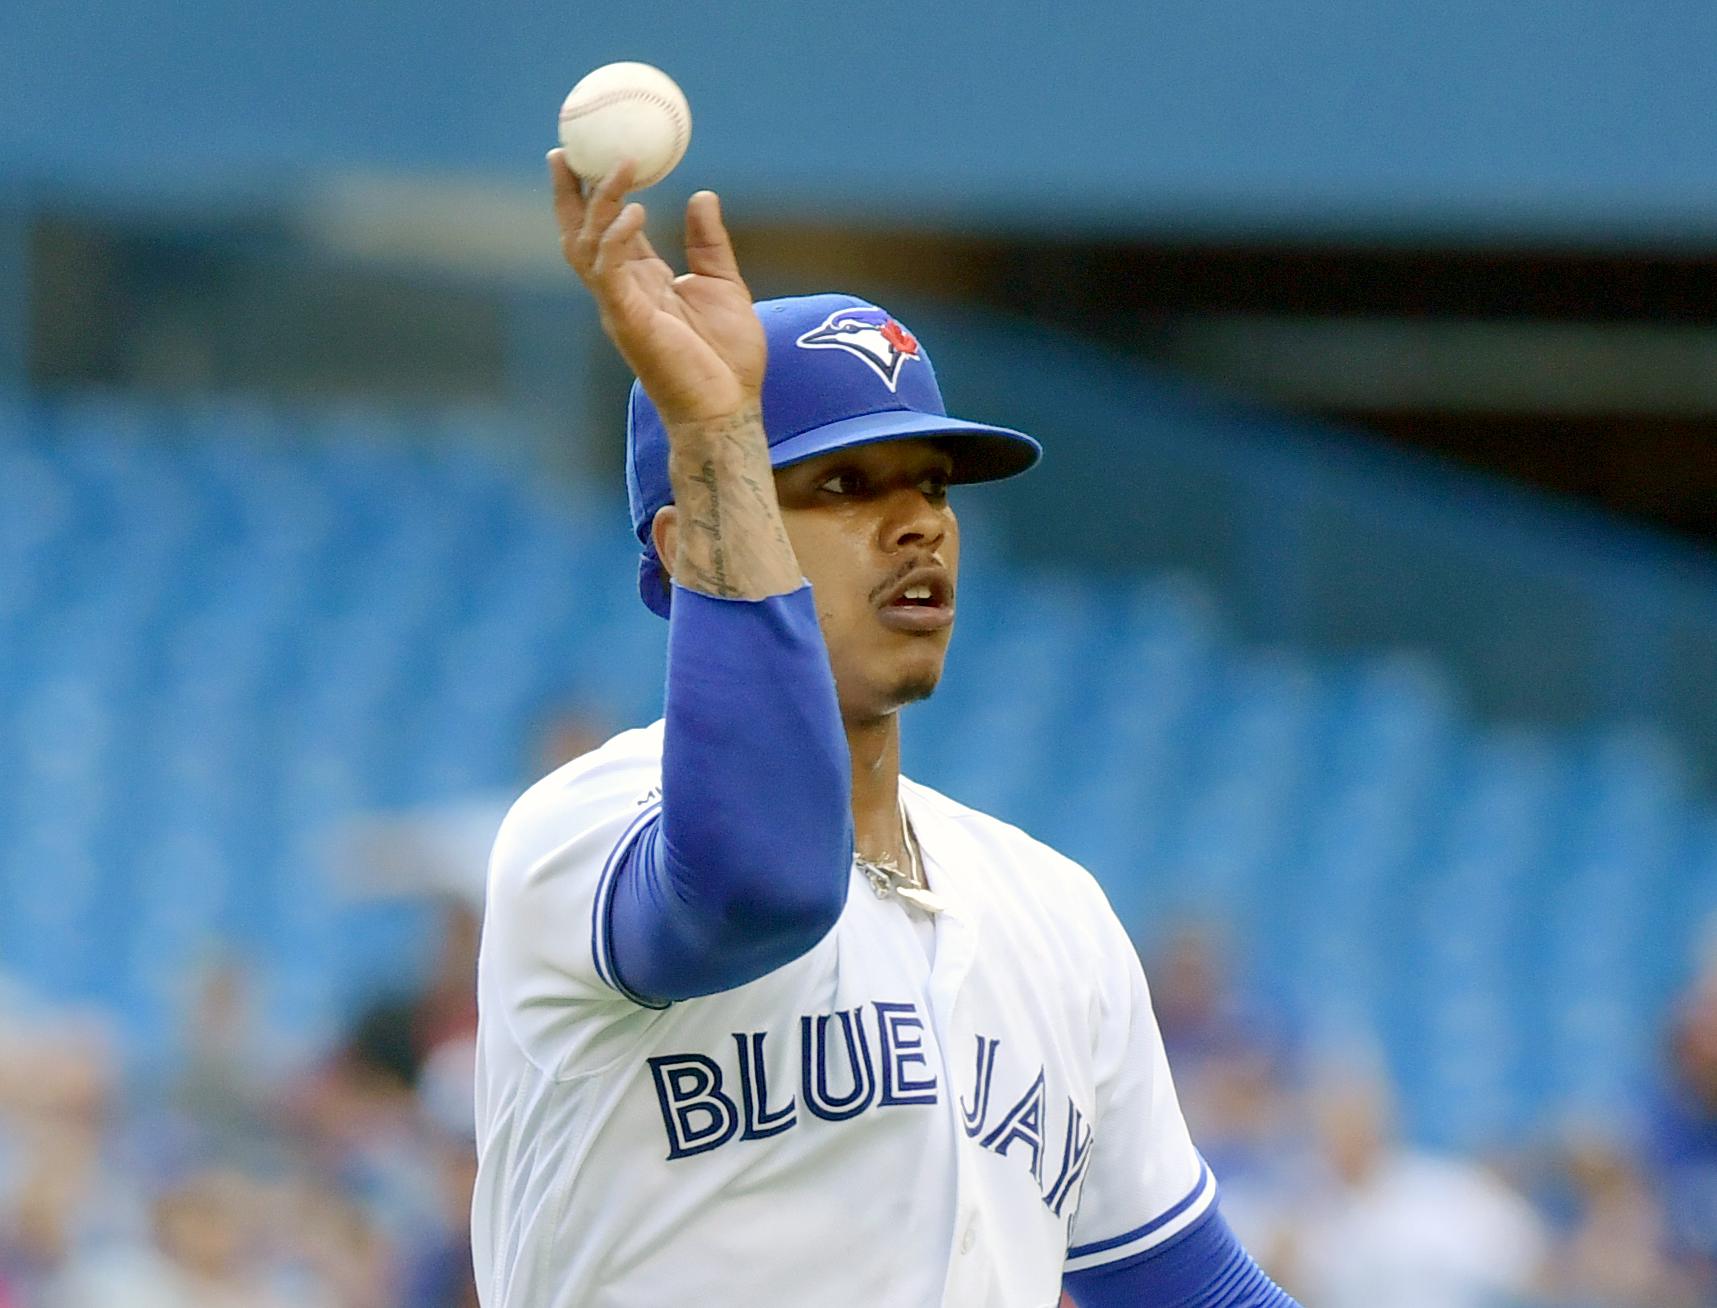 MLB: Kansas City Royals at Toronto Blue Jays